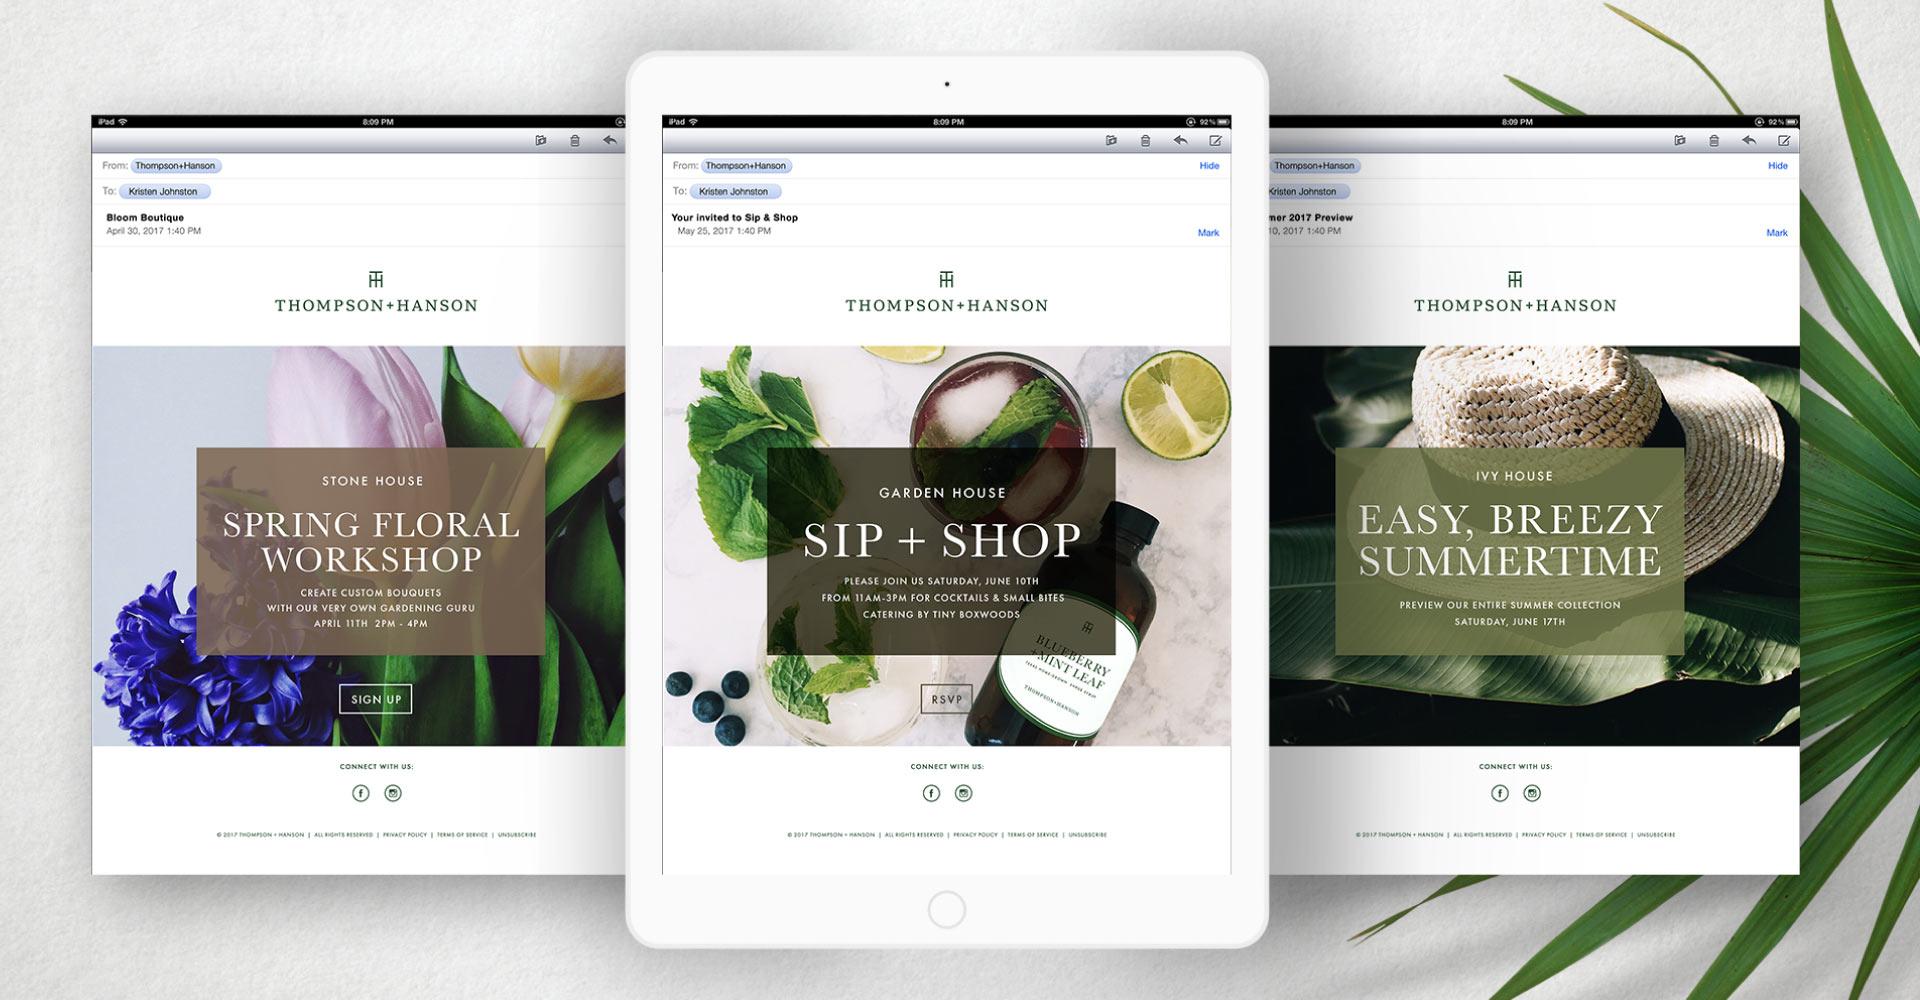 Creative_Retail_Packaging_Thompson_Hanson_Branding_15.jpg